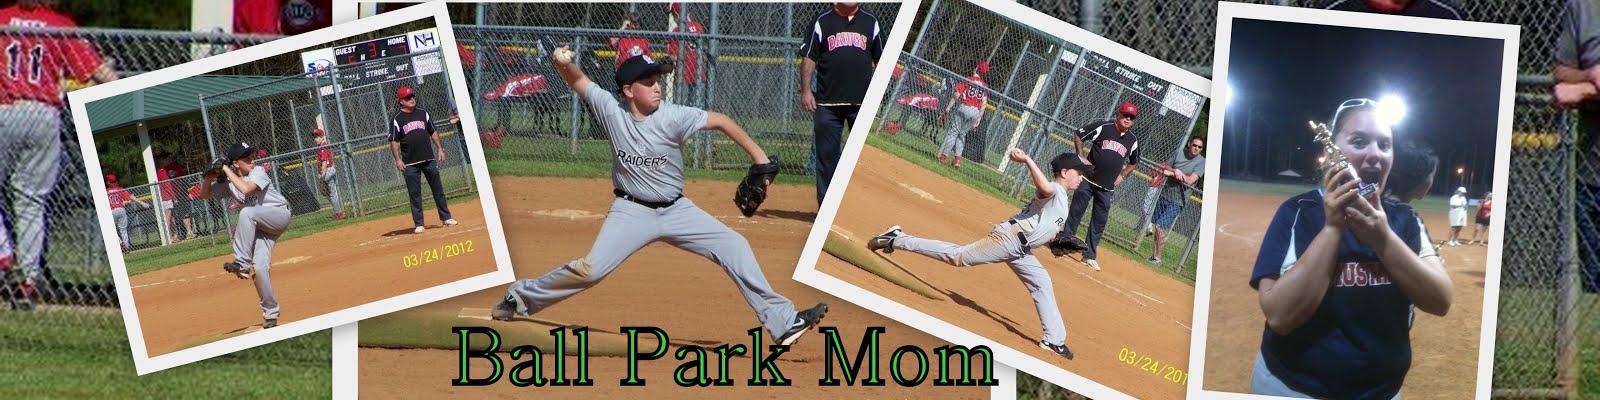 Ballpark mom